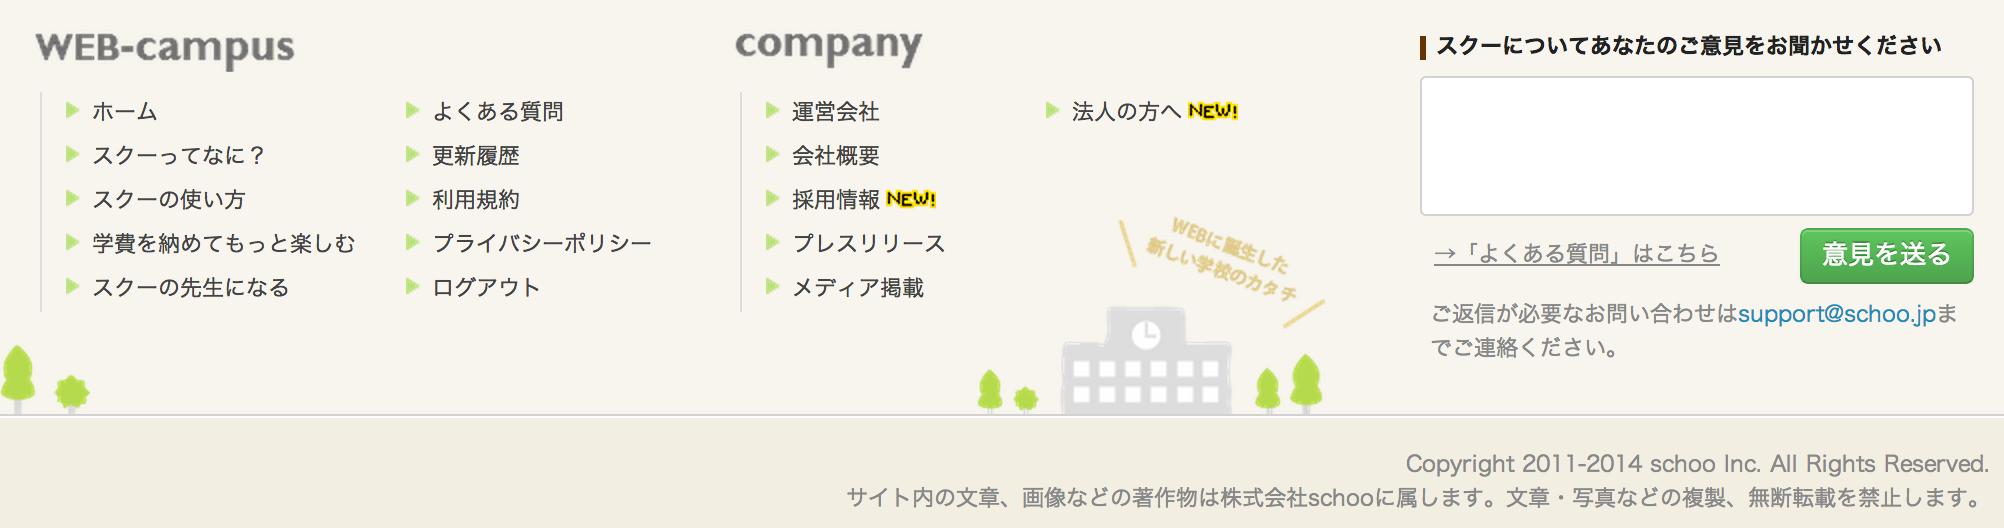 schoo(スクー)_WEB-campus